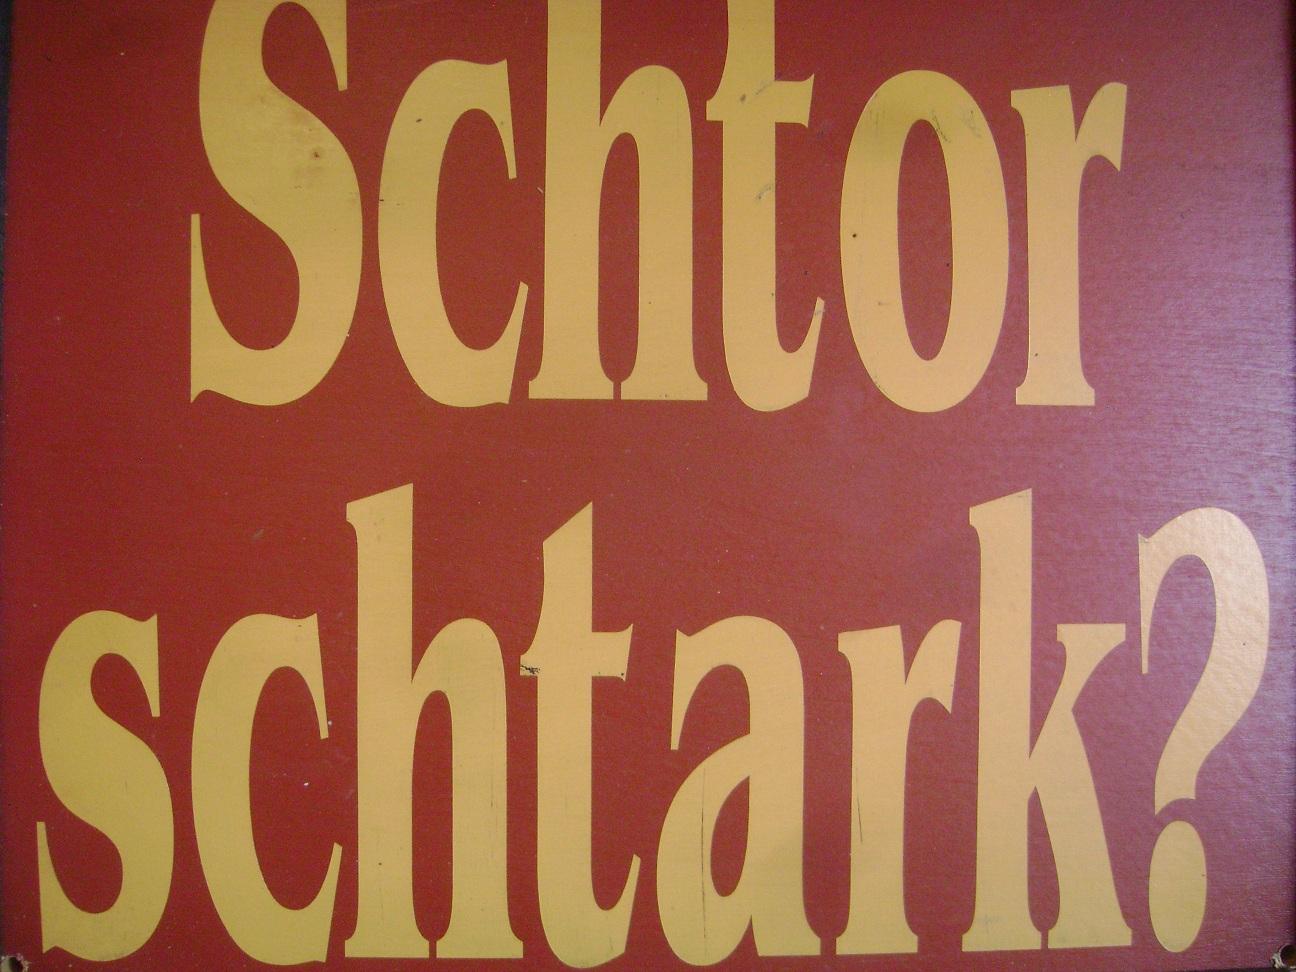 Tabla_Schtor_schtark_2.JPG